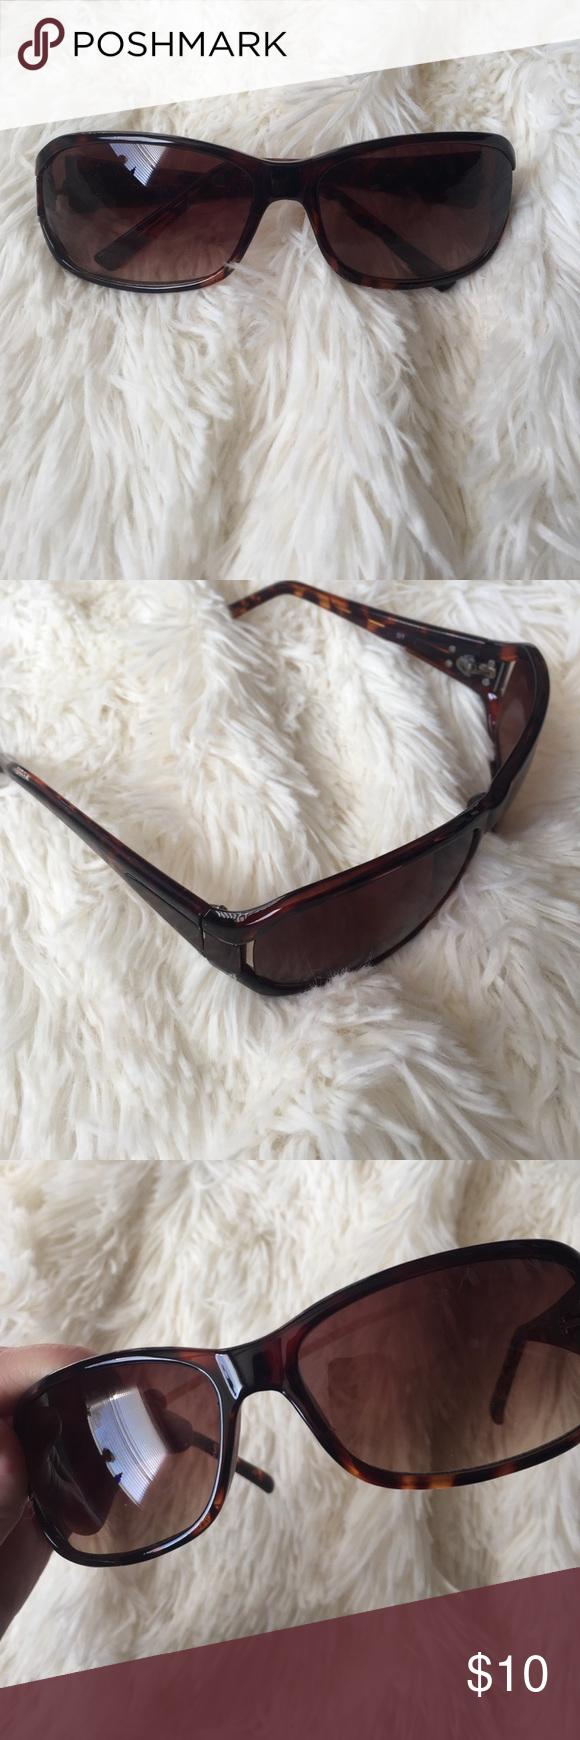 Dana Buchman Tortoise Shell Sunglasses Super cute, very light scratching on the lenses, but still in good condition! No trades! Dana Buchman Accessories Sunglasses